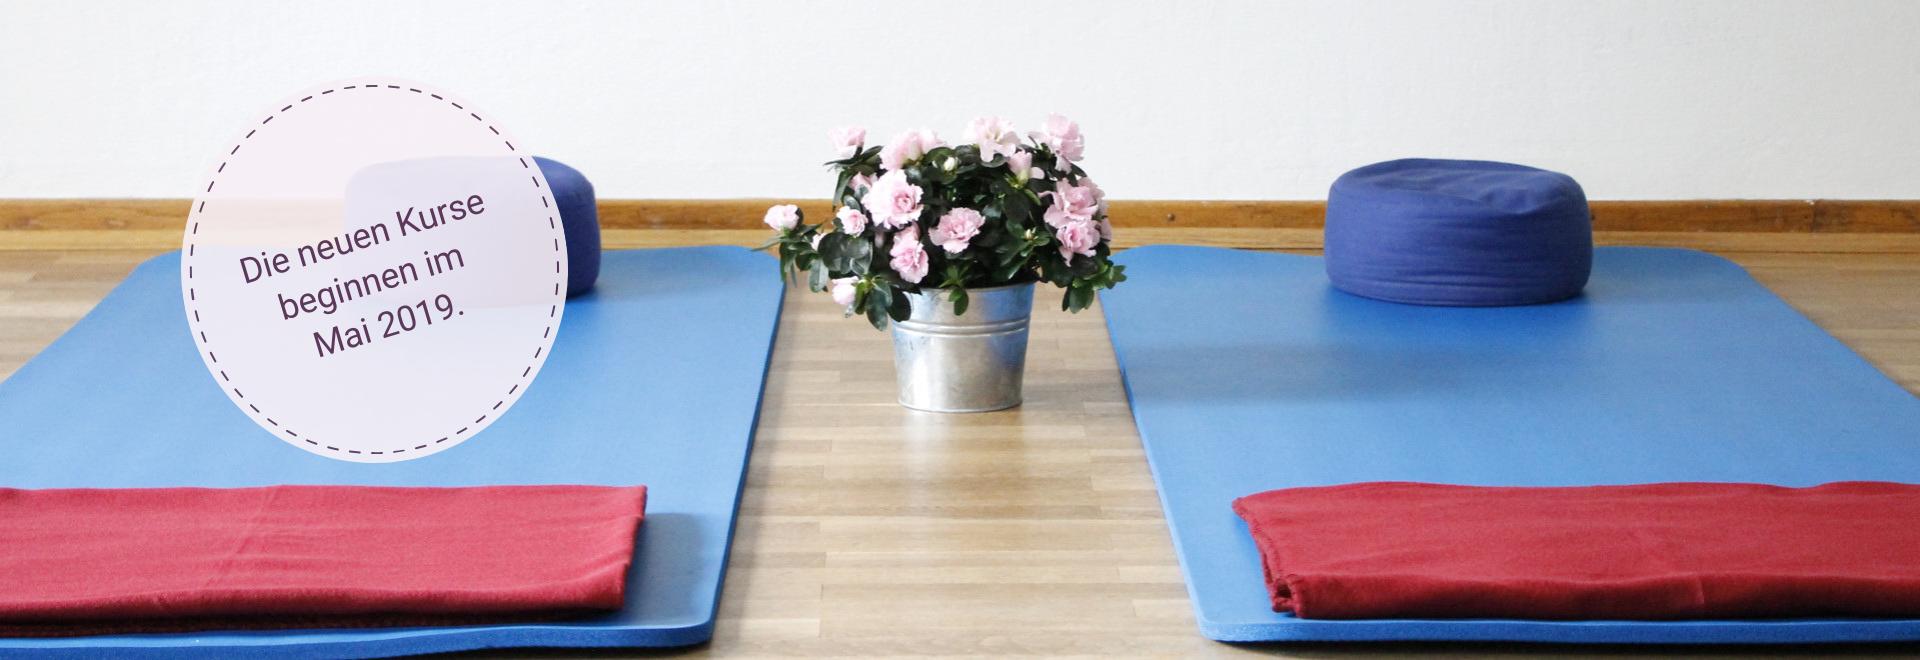 Yogakurse Wolfenbüttel Termine 2019 Mai